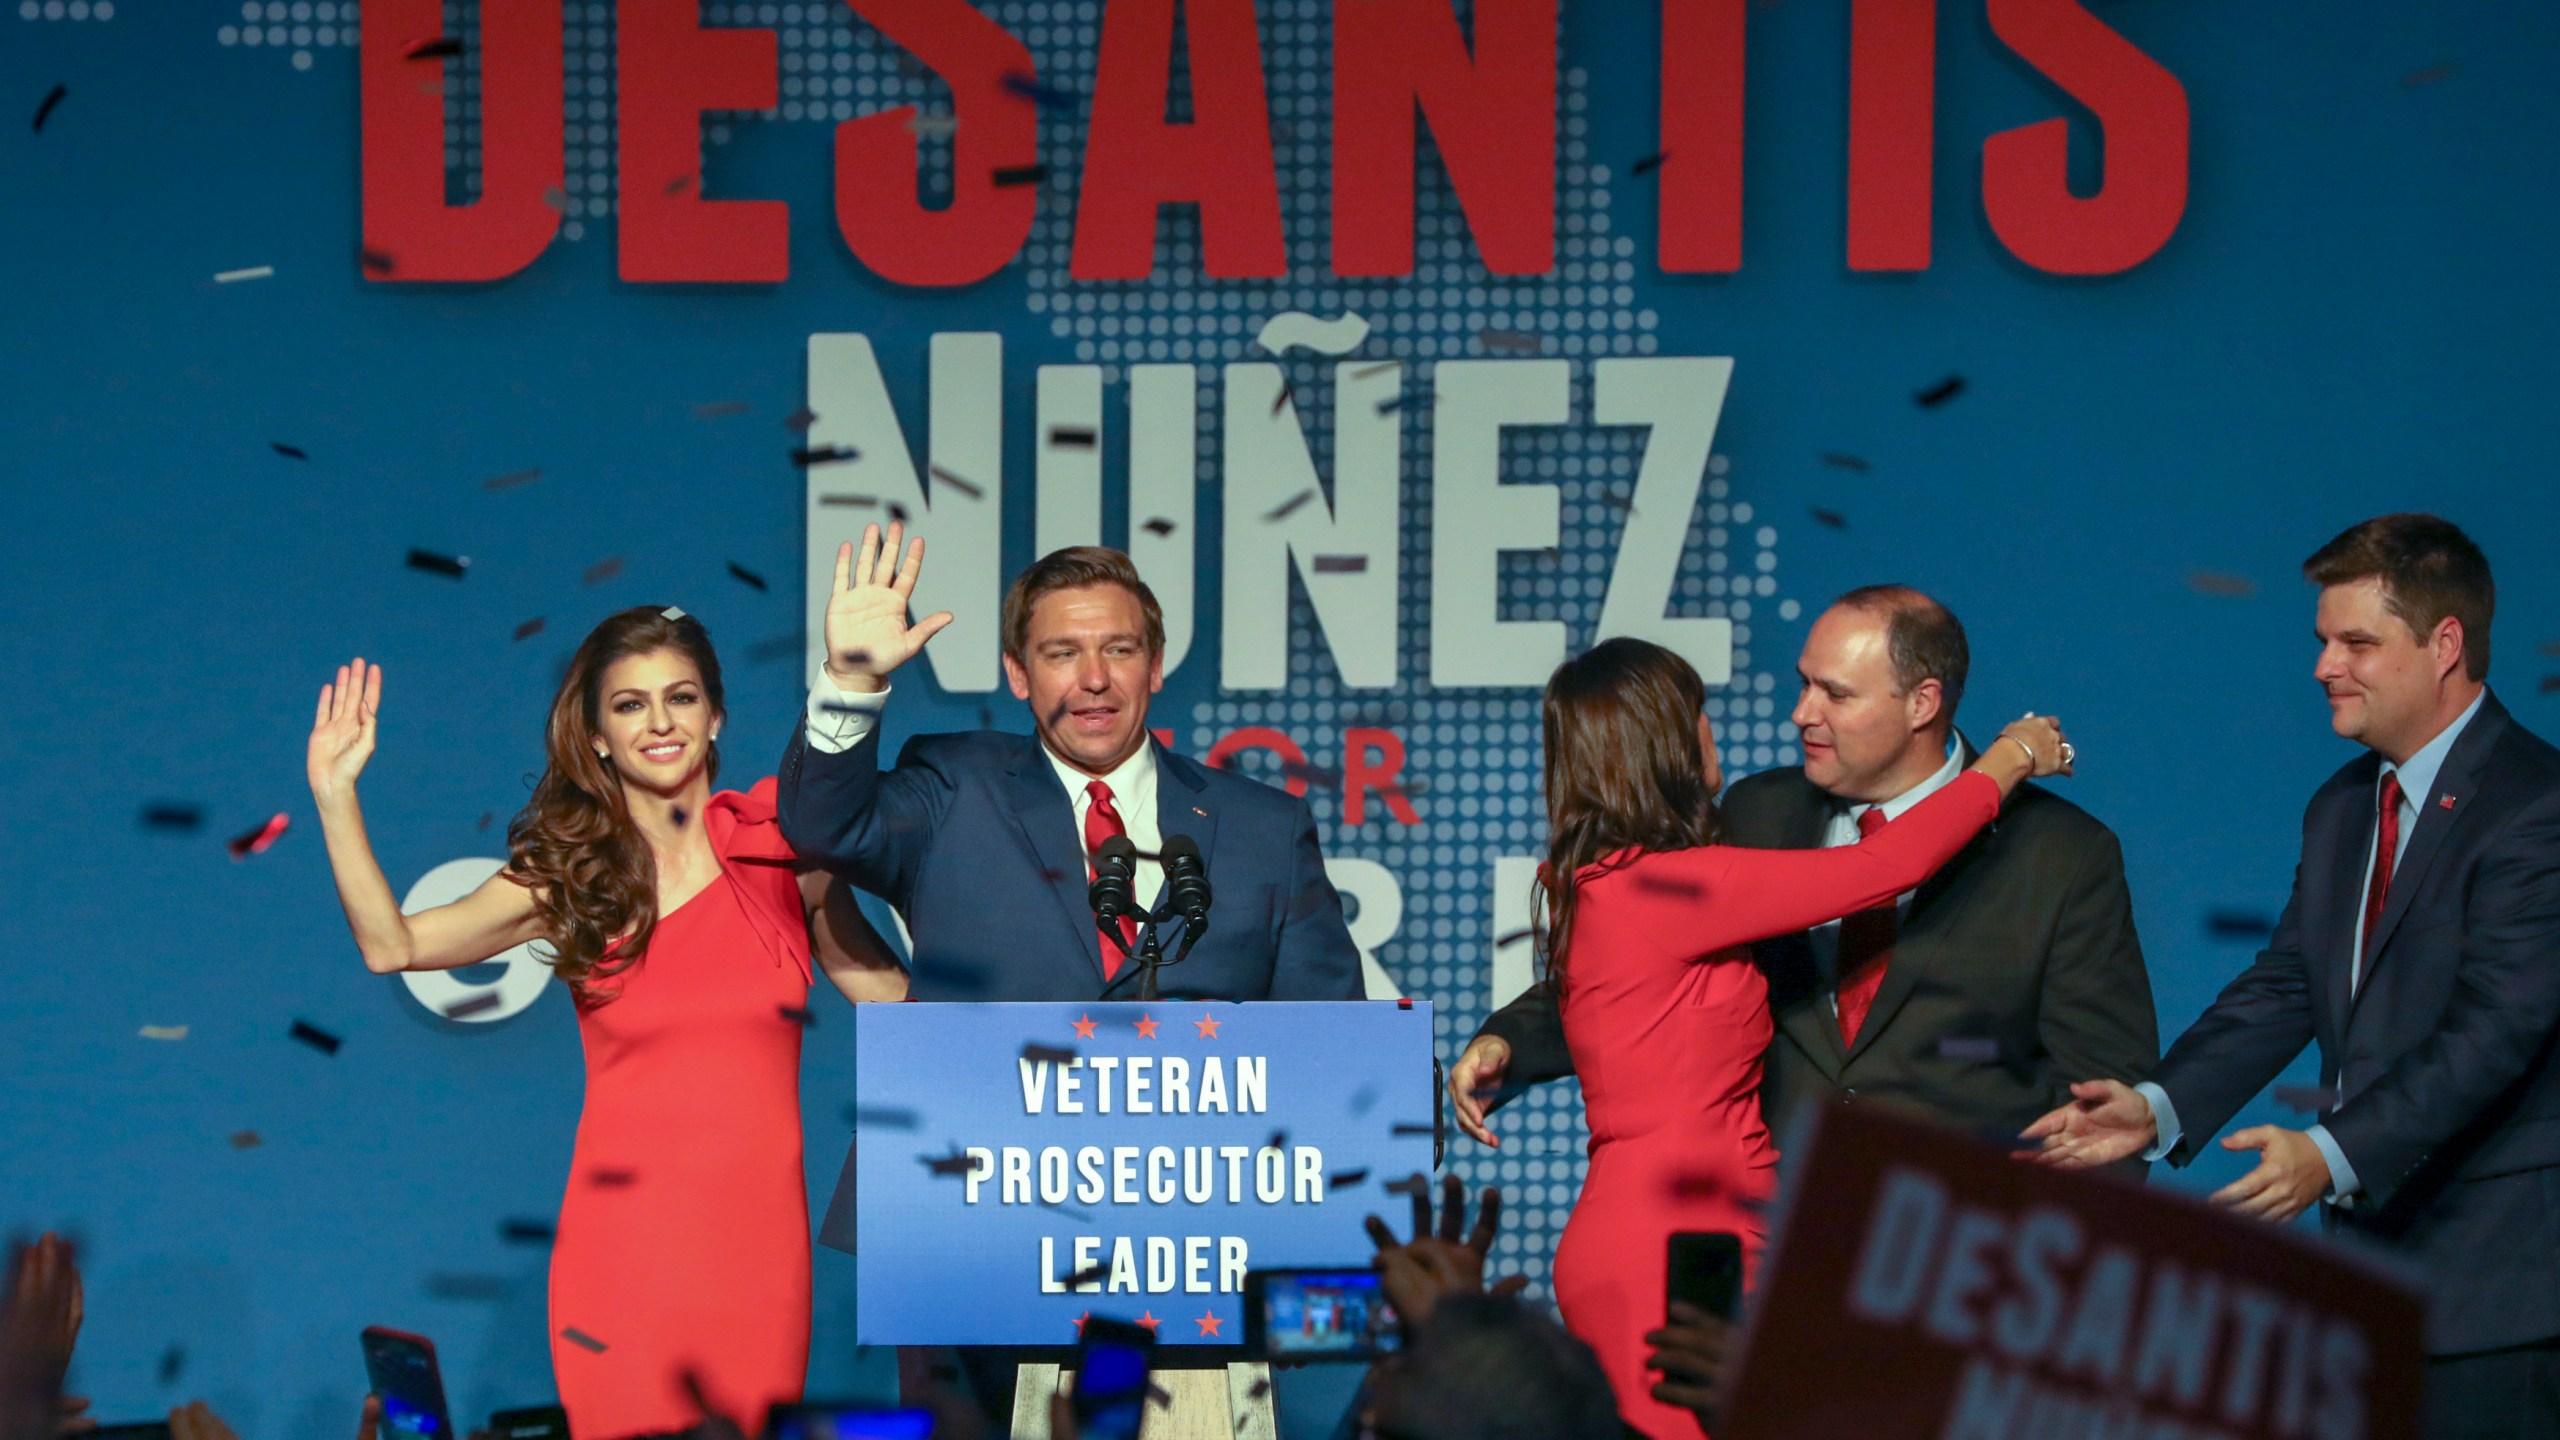 APTOPIX_Election_2018_Governor_DeSantis_Florida_05193-159532.jpg68926866